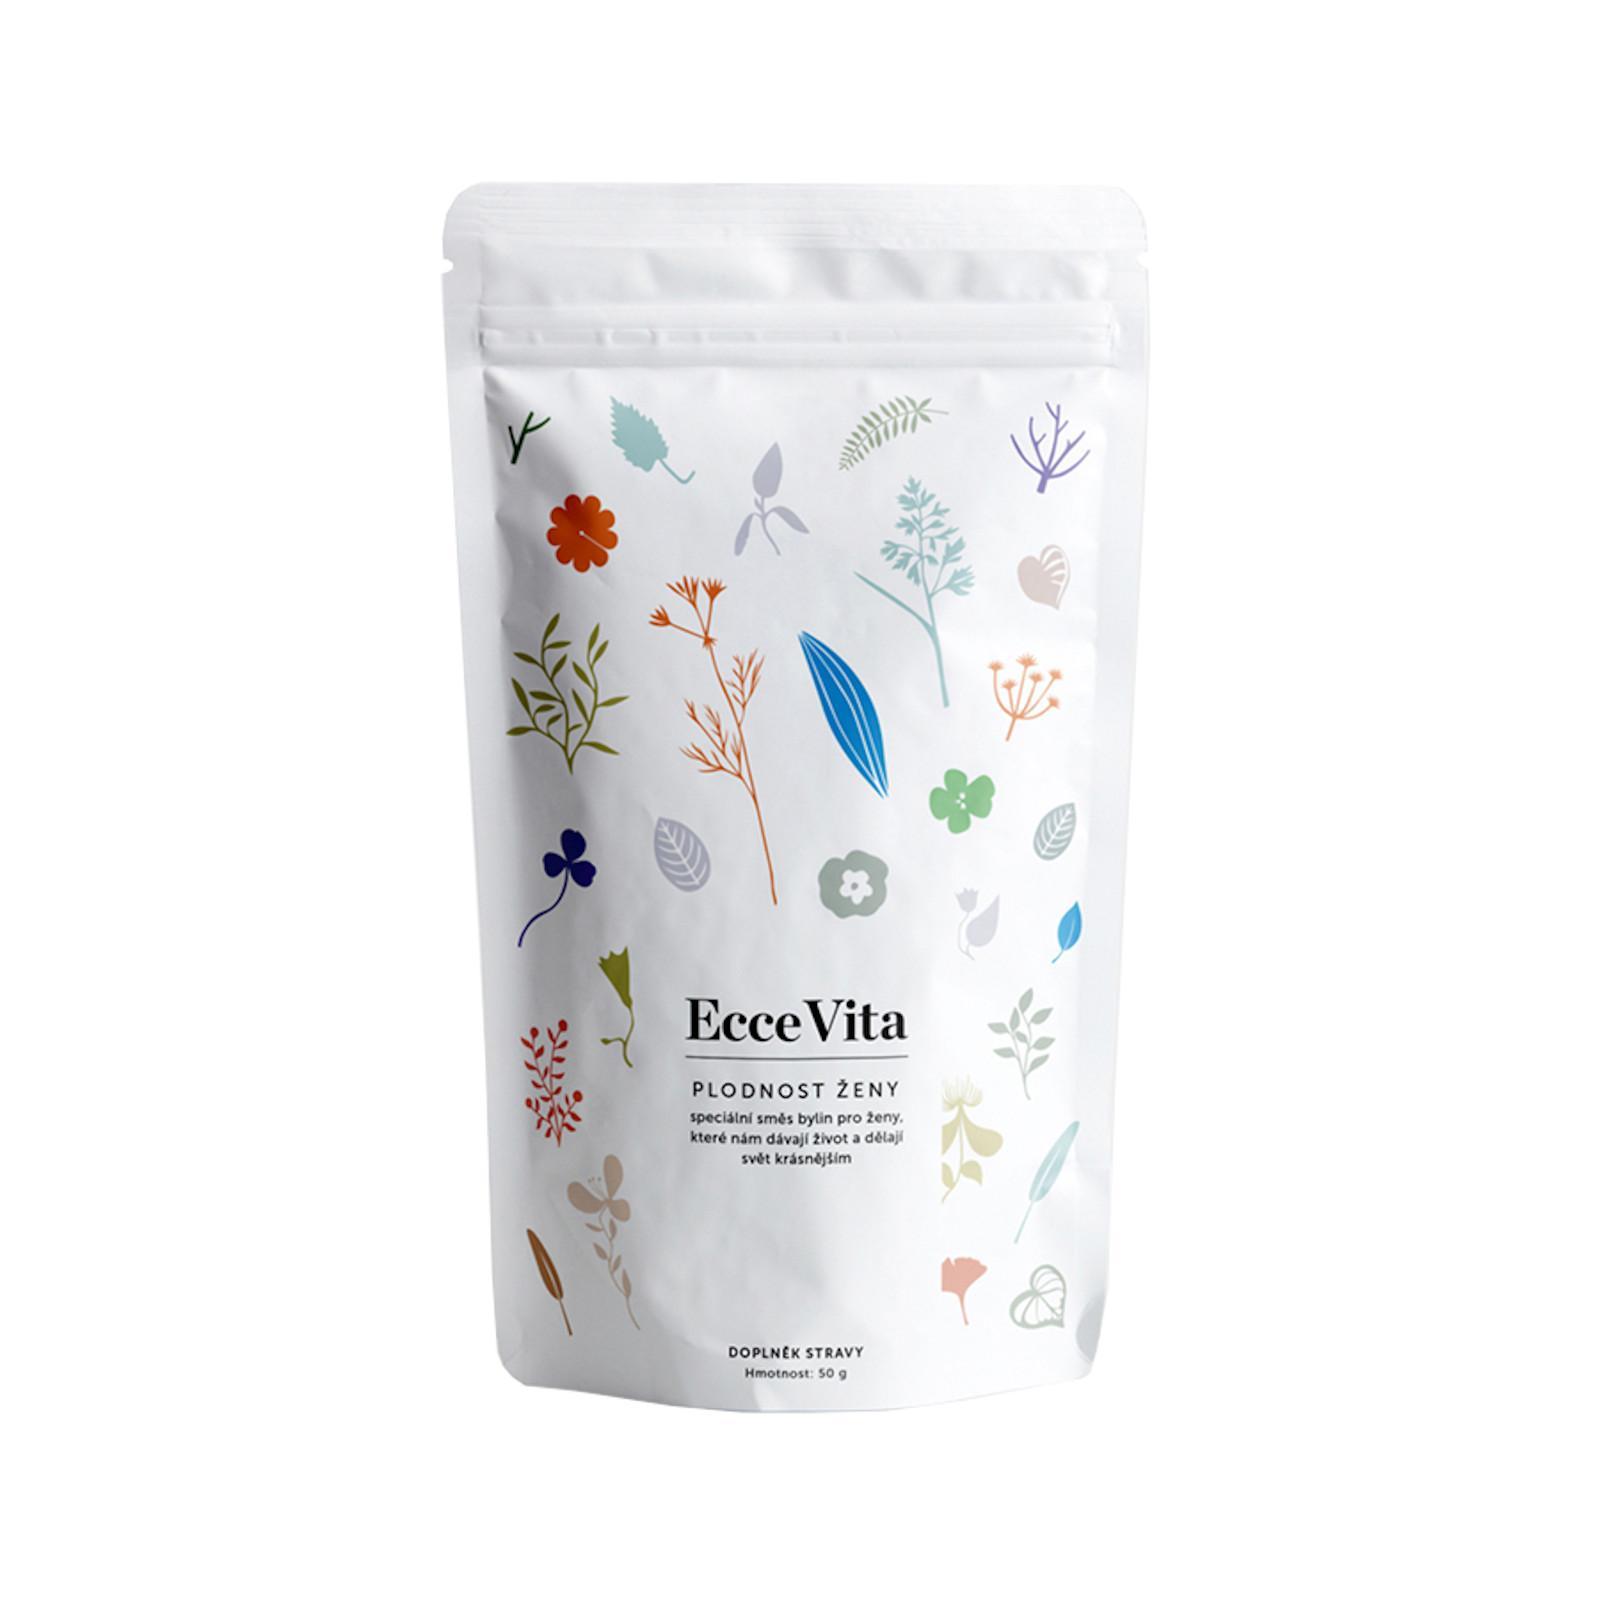 Ecce Vita Bylinný čaj sypaný Plodnost ženy 50 g